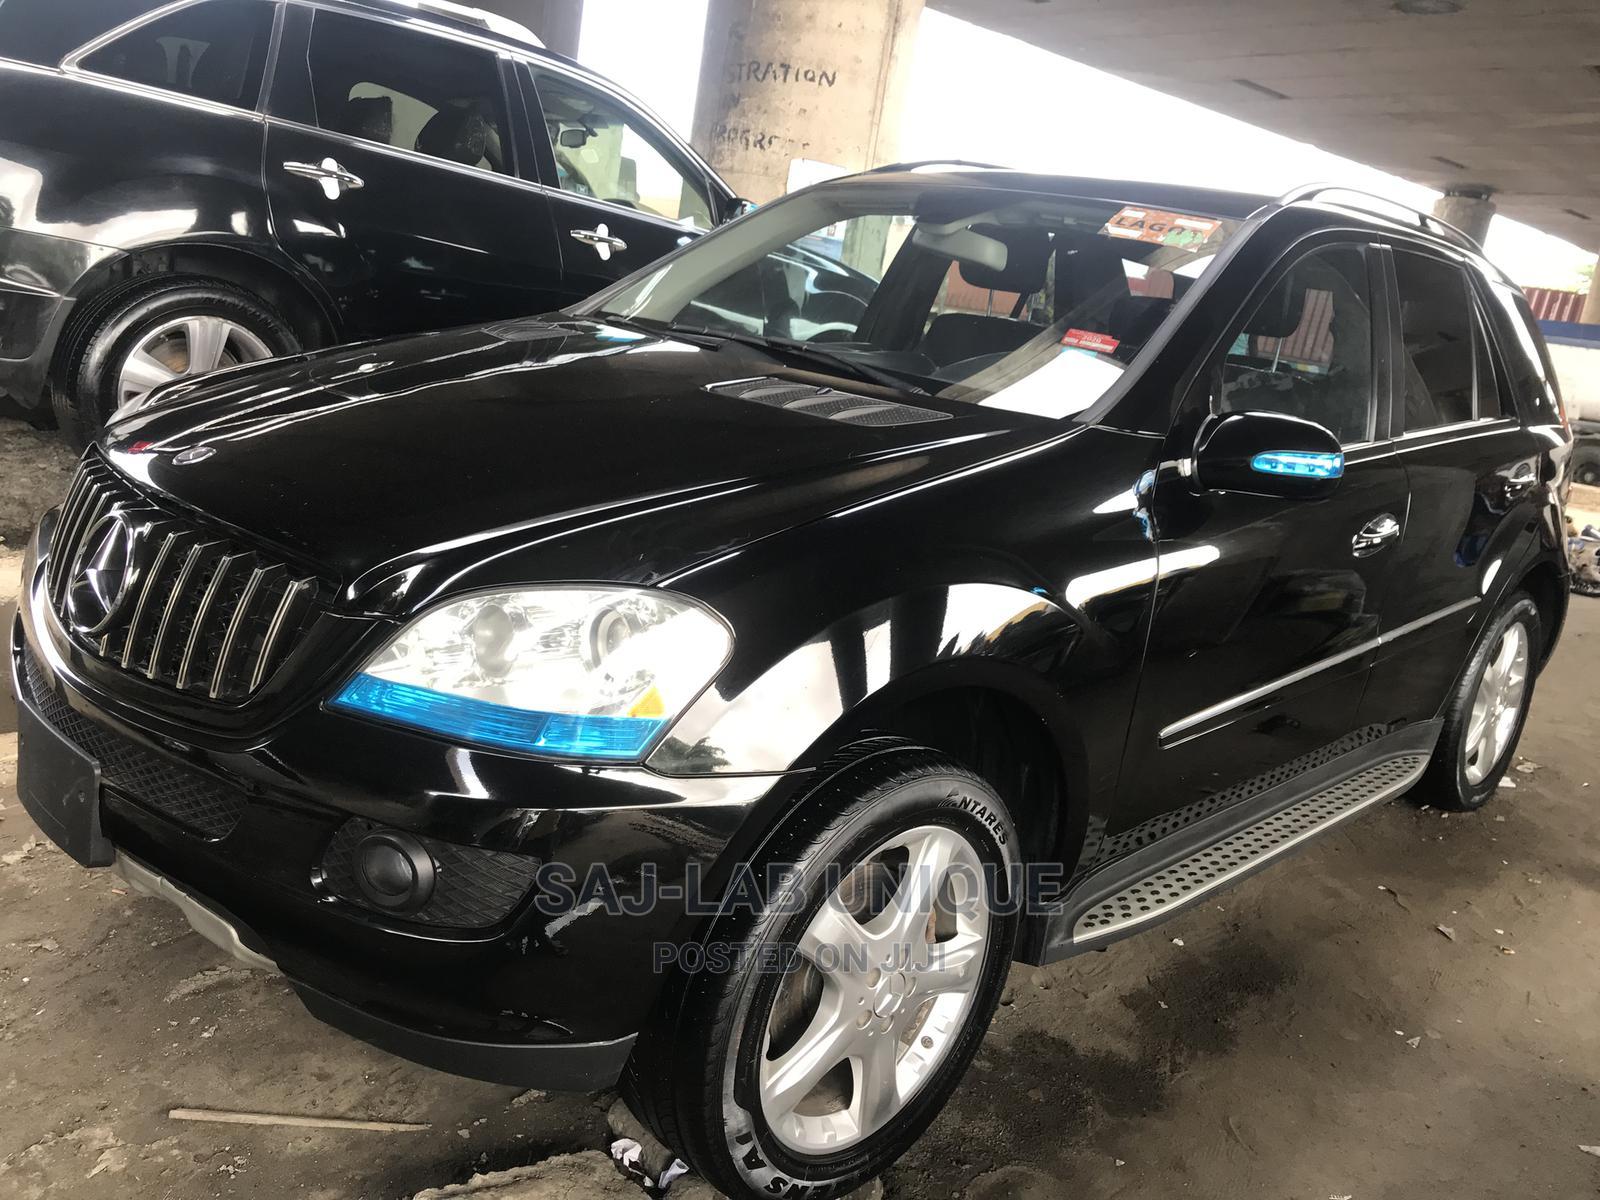 Mercedes-Benz M Class 2008 Black   Cars for sale in Apapa, Lagos State, Nigeria